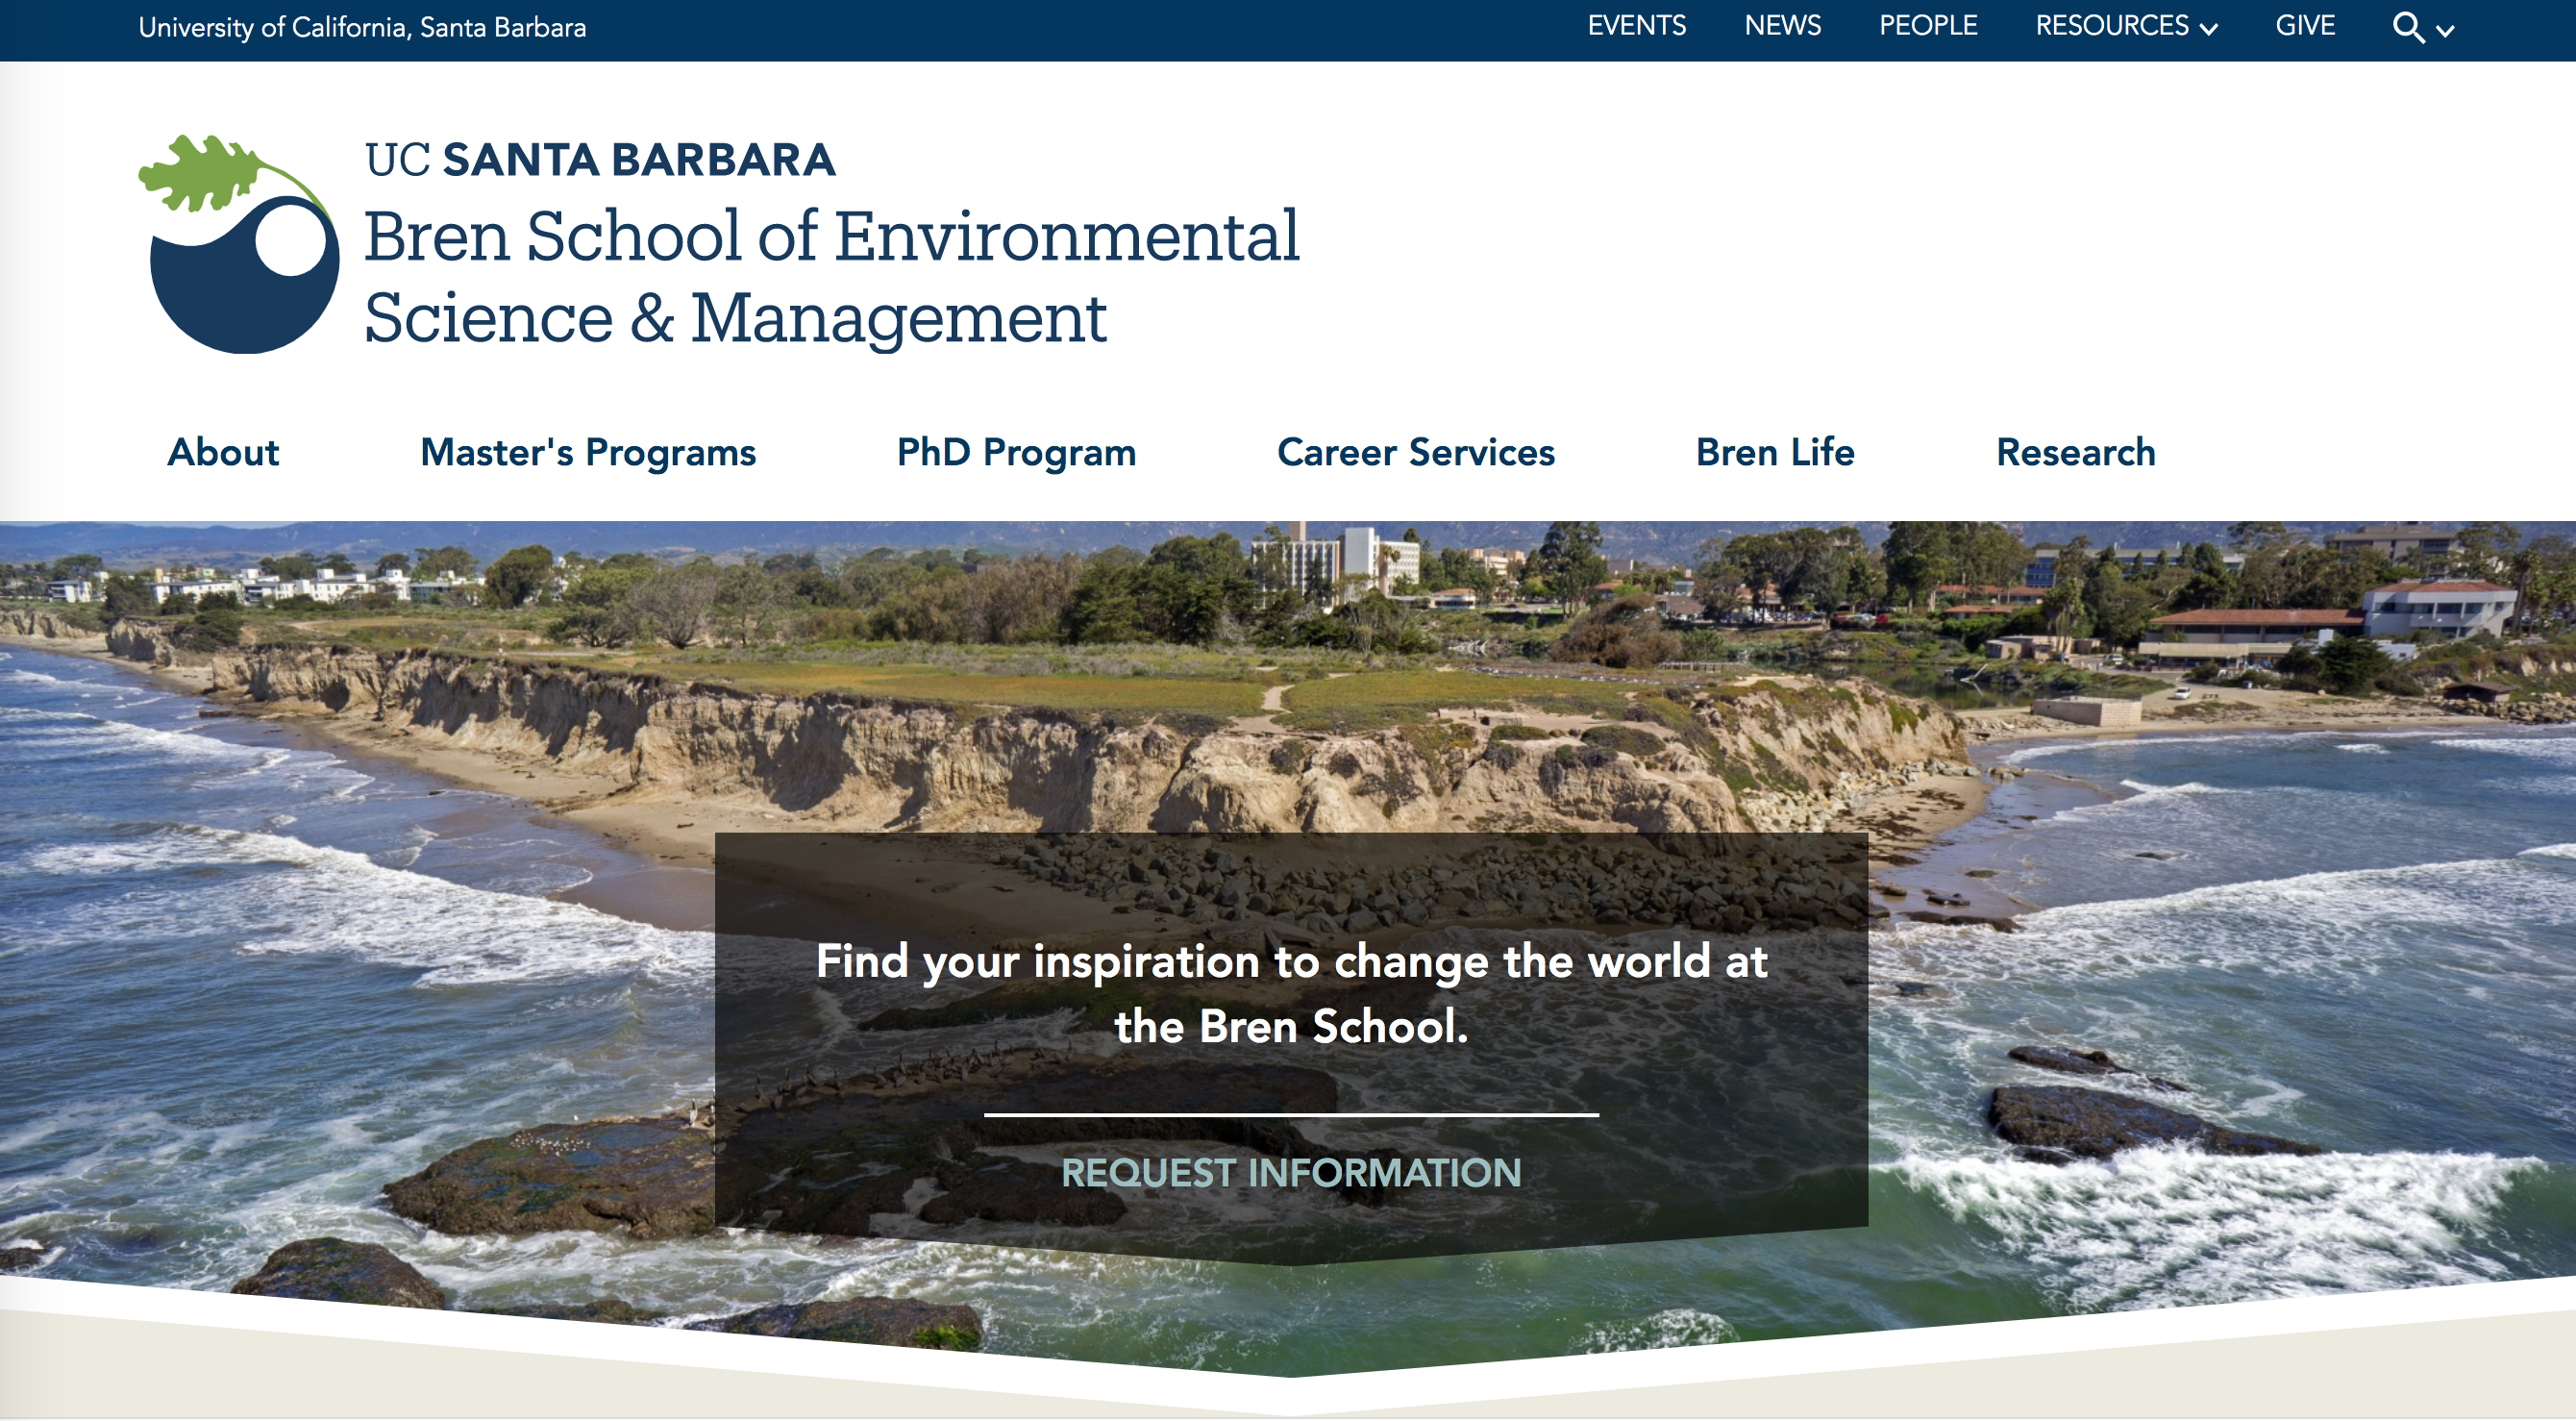 Bren School home page image